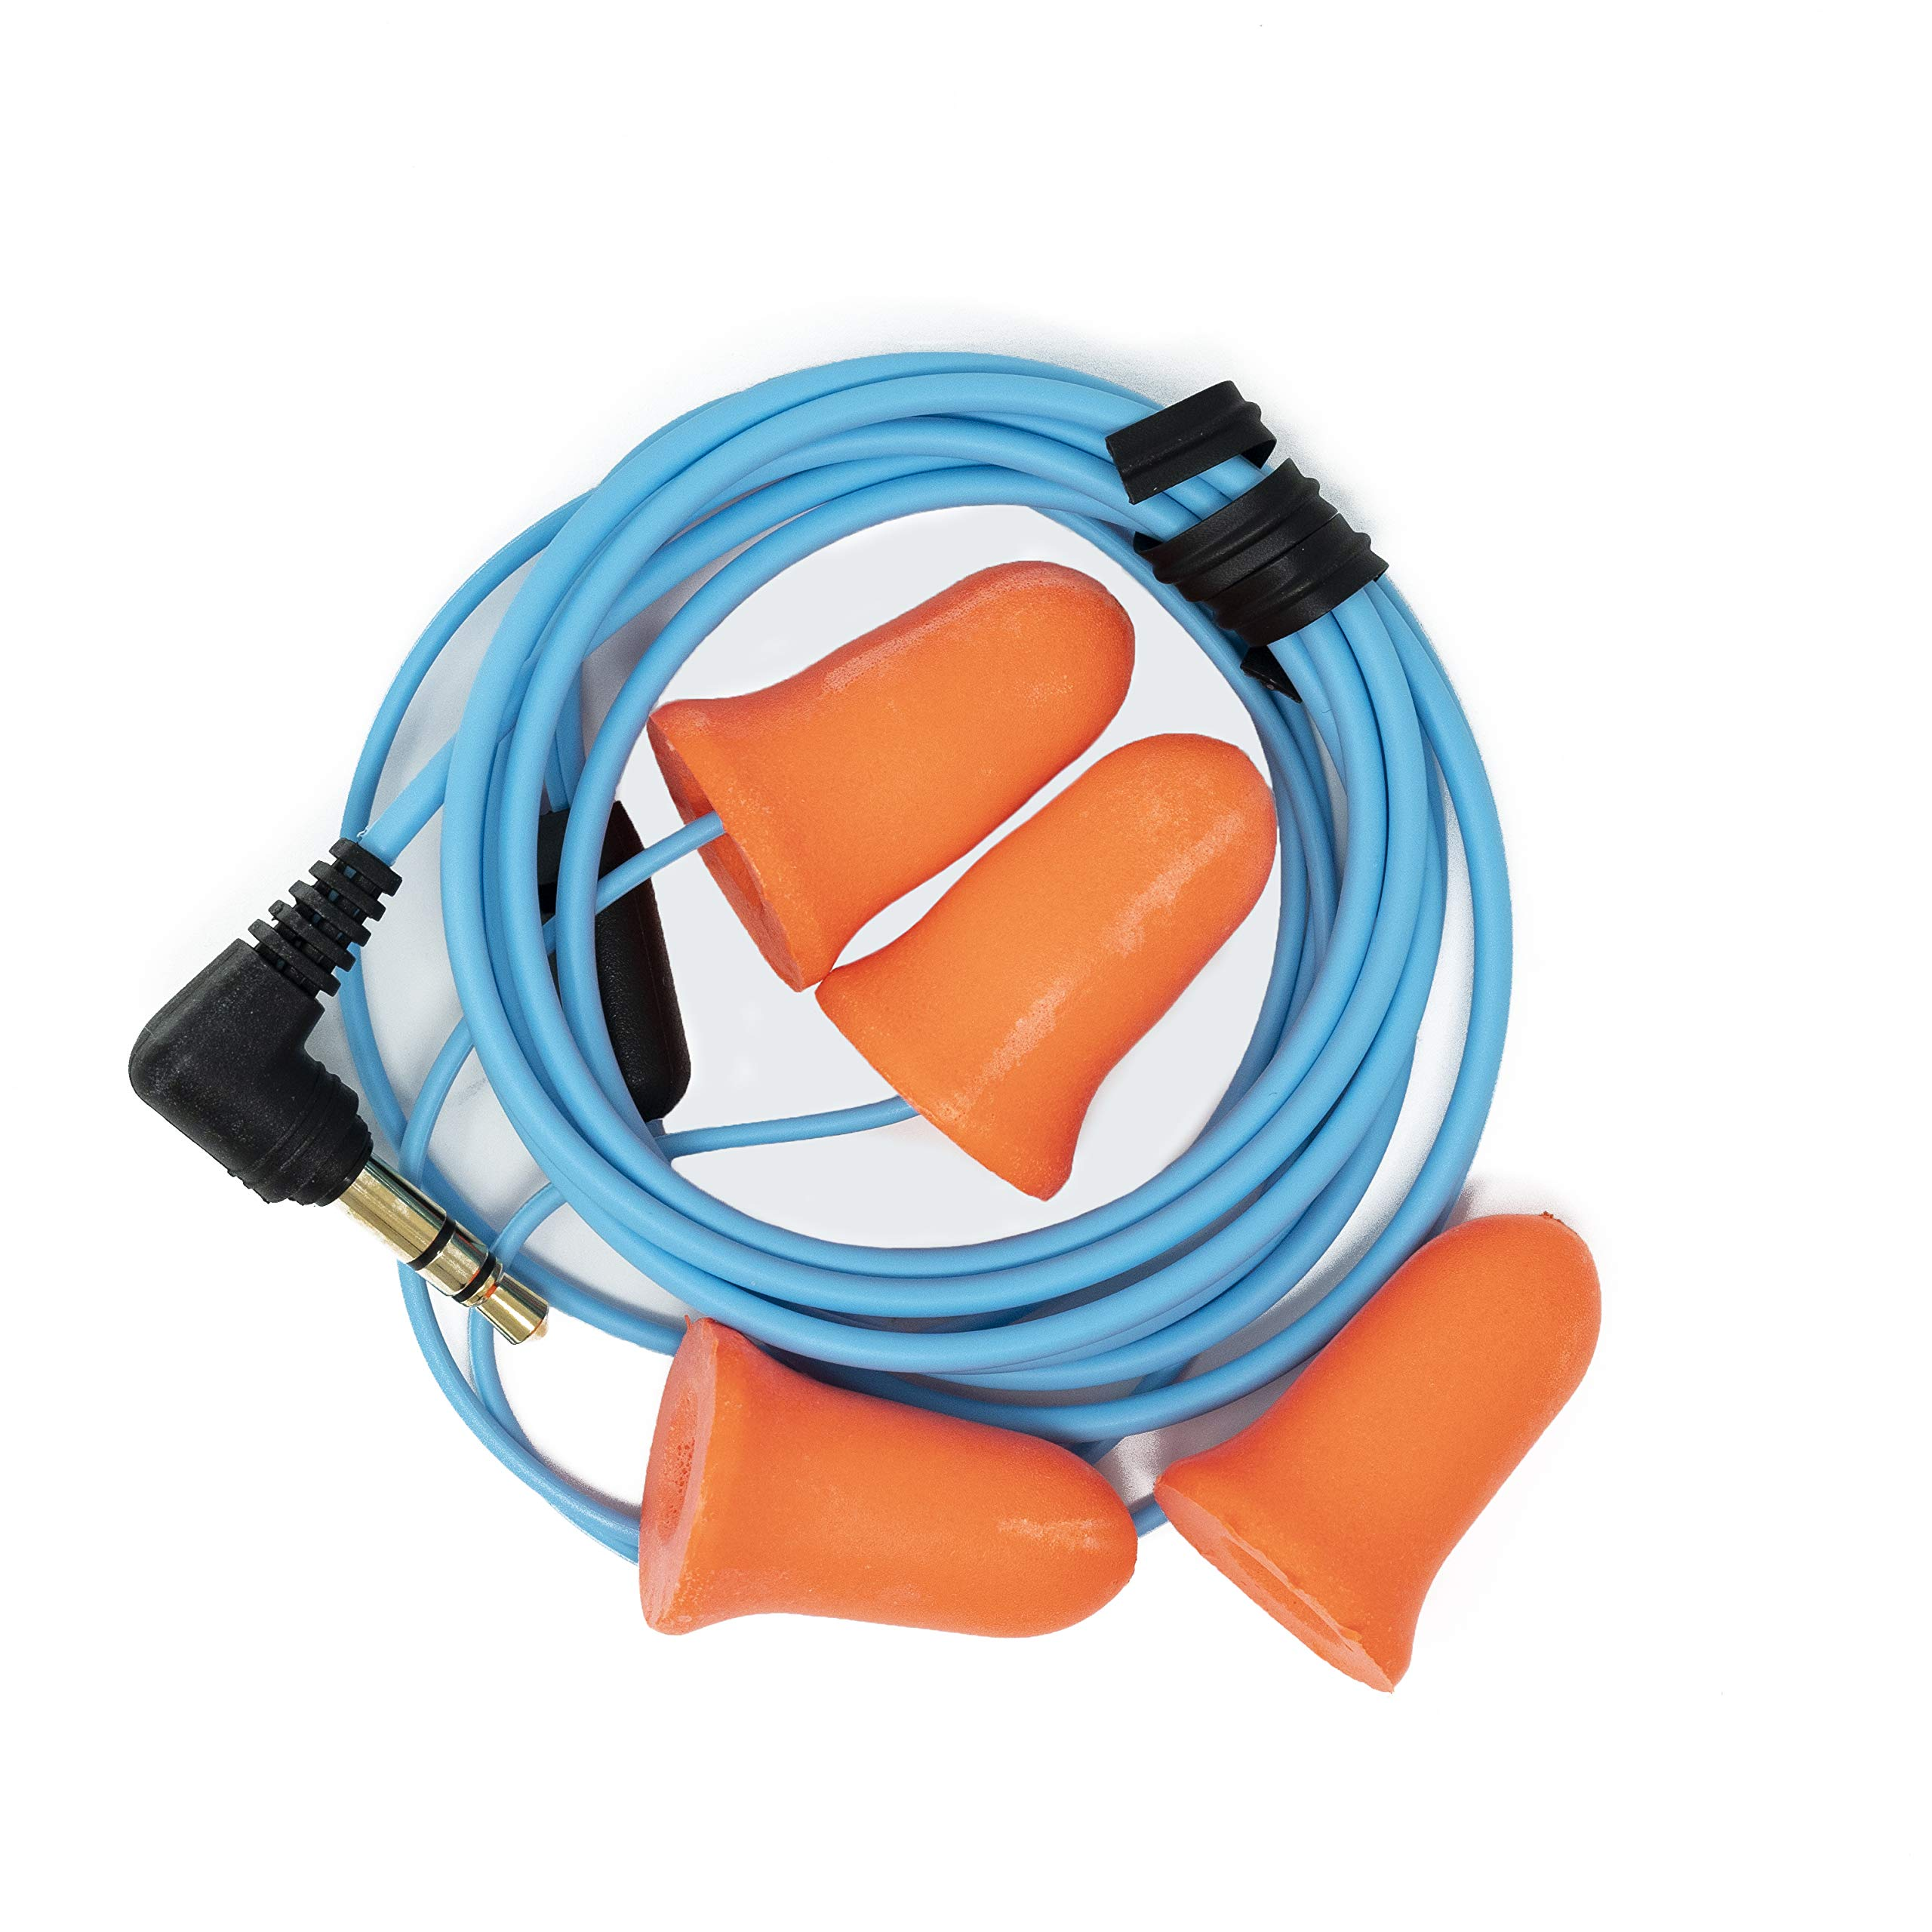 Plugfones Ear Plugs / Earbuds - 1st Generation (Orange) () by Plugfones (Image #2)